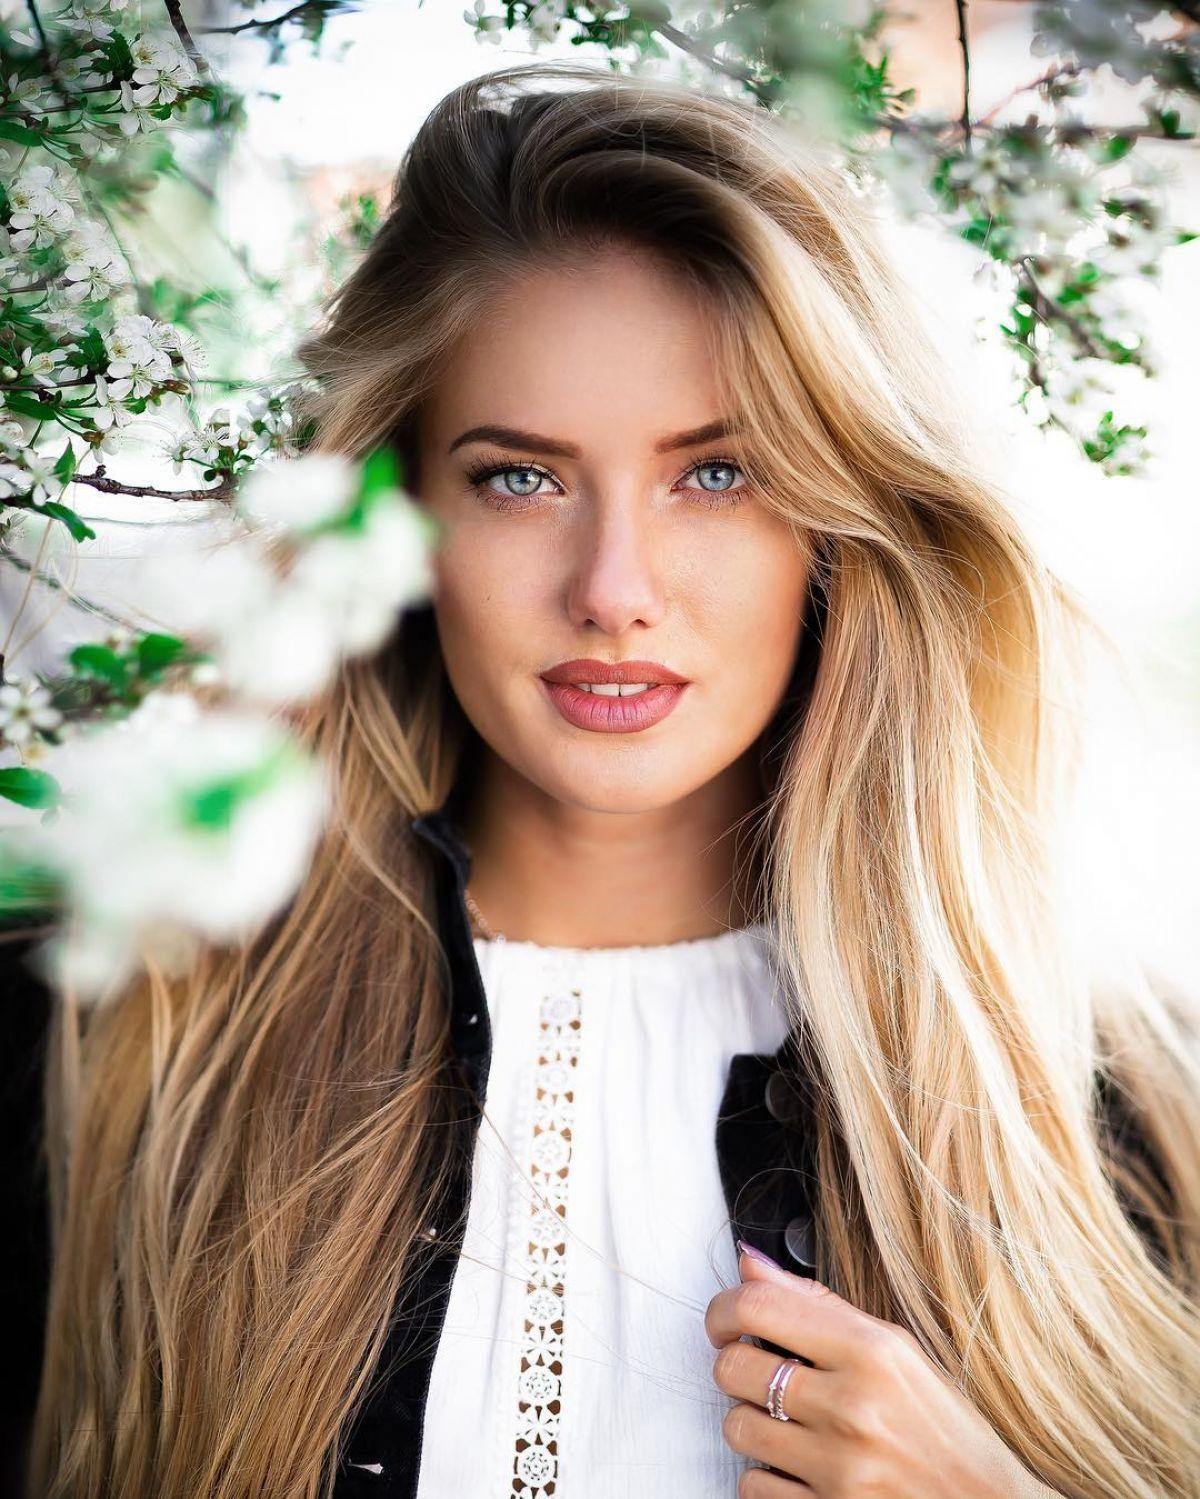 ALICA SCHMIDT - Instagram Photos and Videos - HawtCelebs